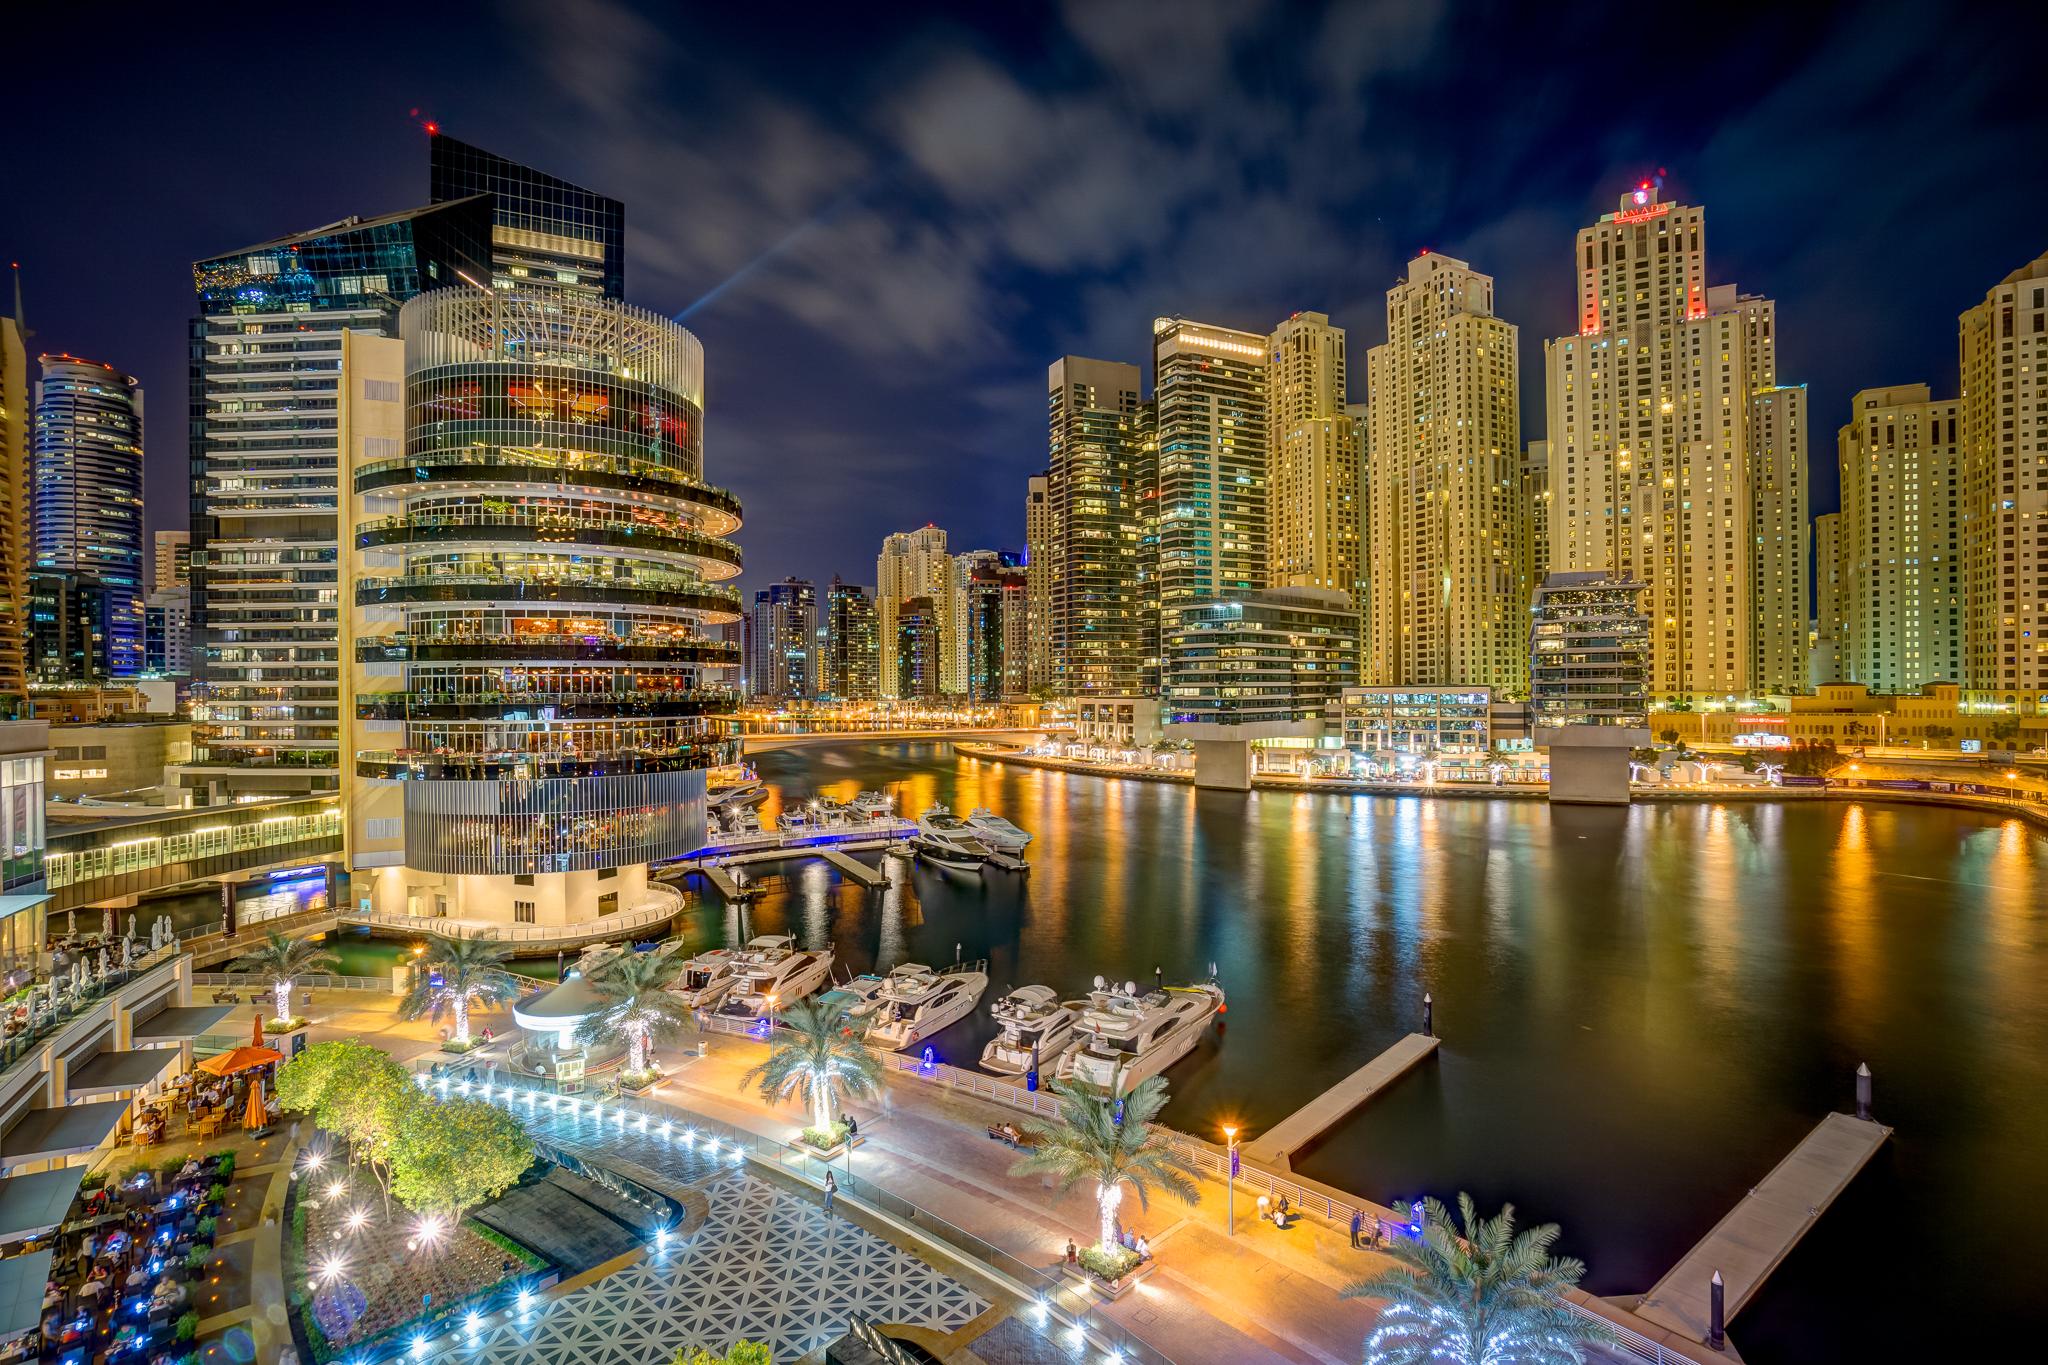 Dubai Marina from Dubai Marina Mall, United Arab Emirates